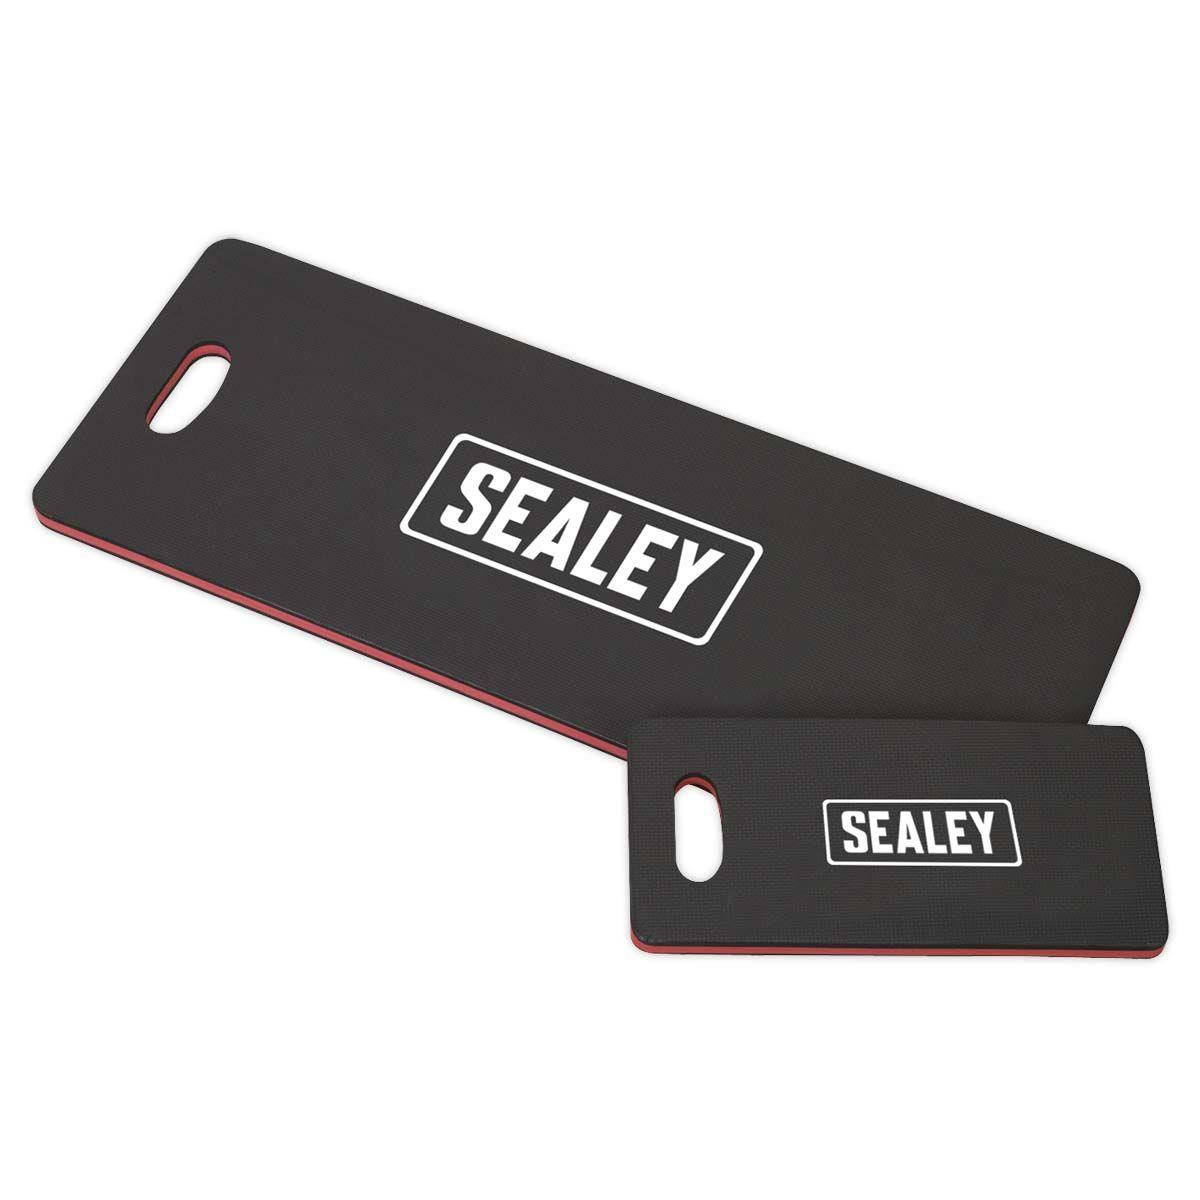 Sealey Mechanic's Mat Set EVA - 28mm